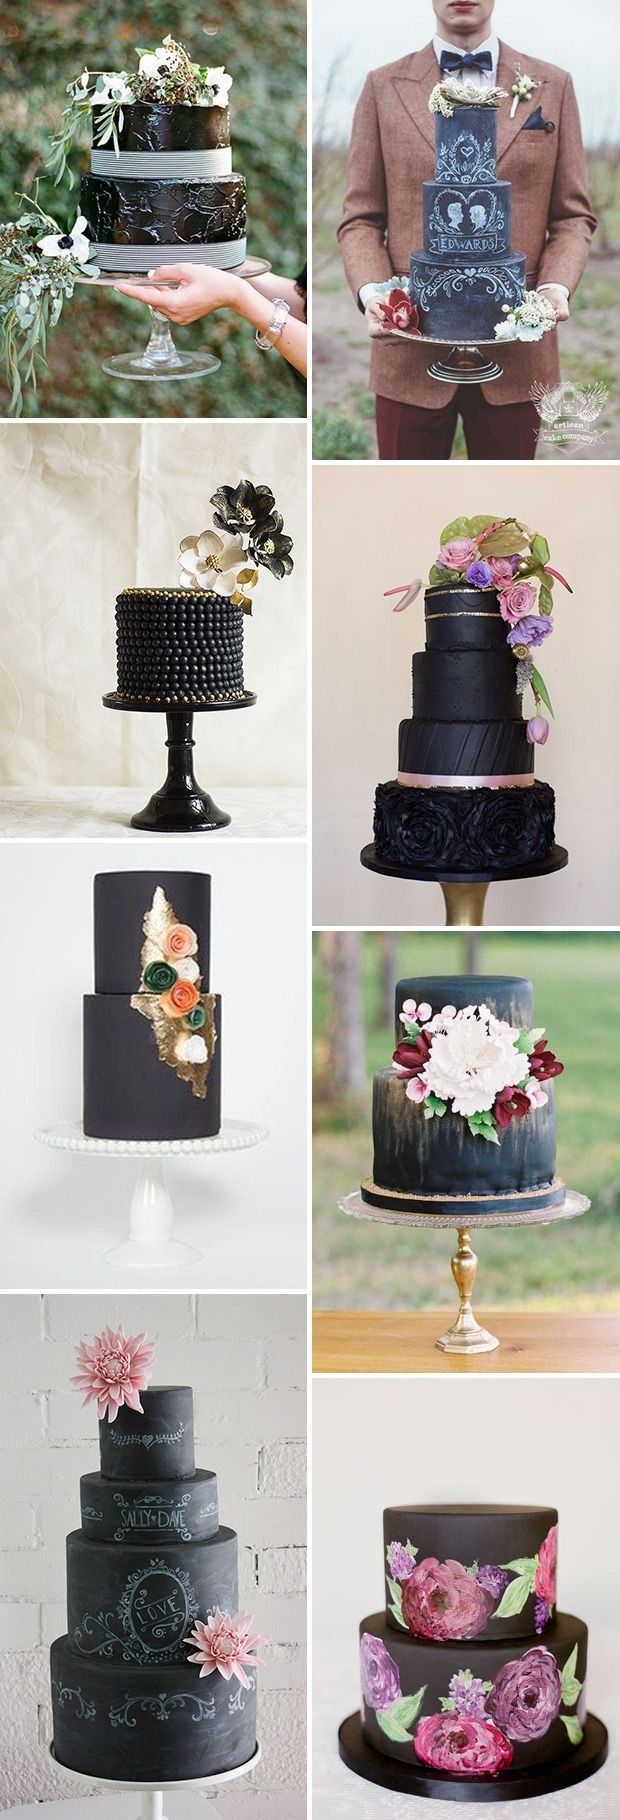 Beautiful black wedding cakes.♥..¸¸.•♥•